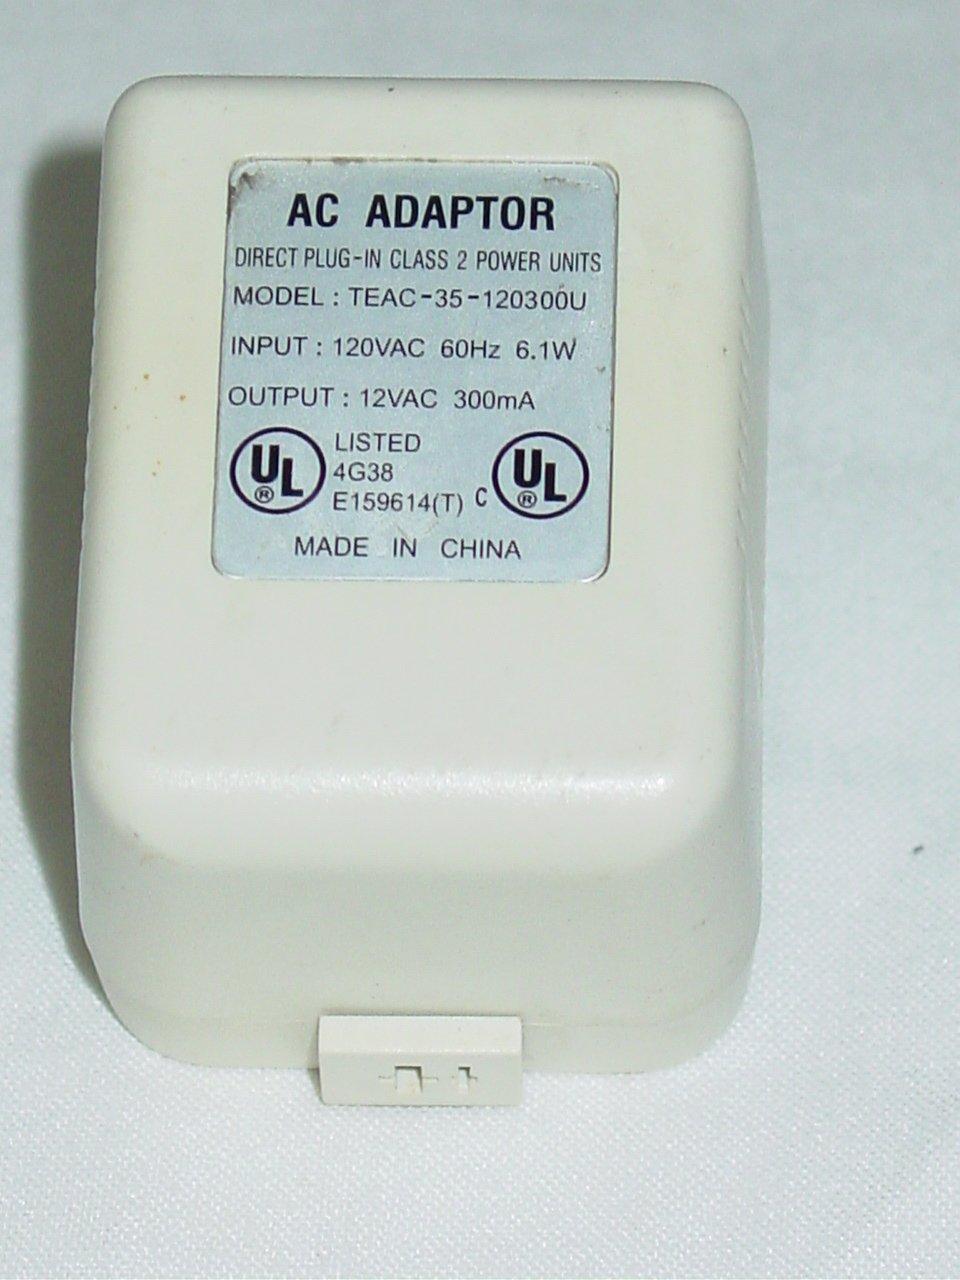 TEAC-35-120300U (without cord) AC Adapter 12VAC 300mA